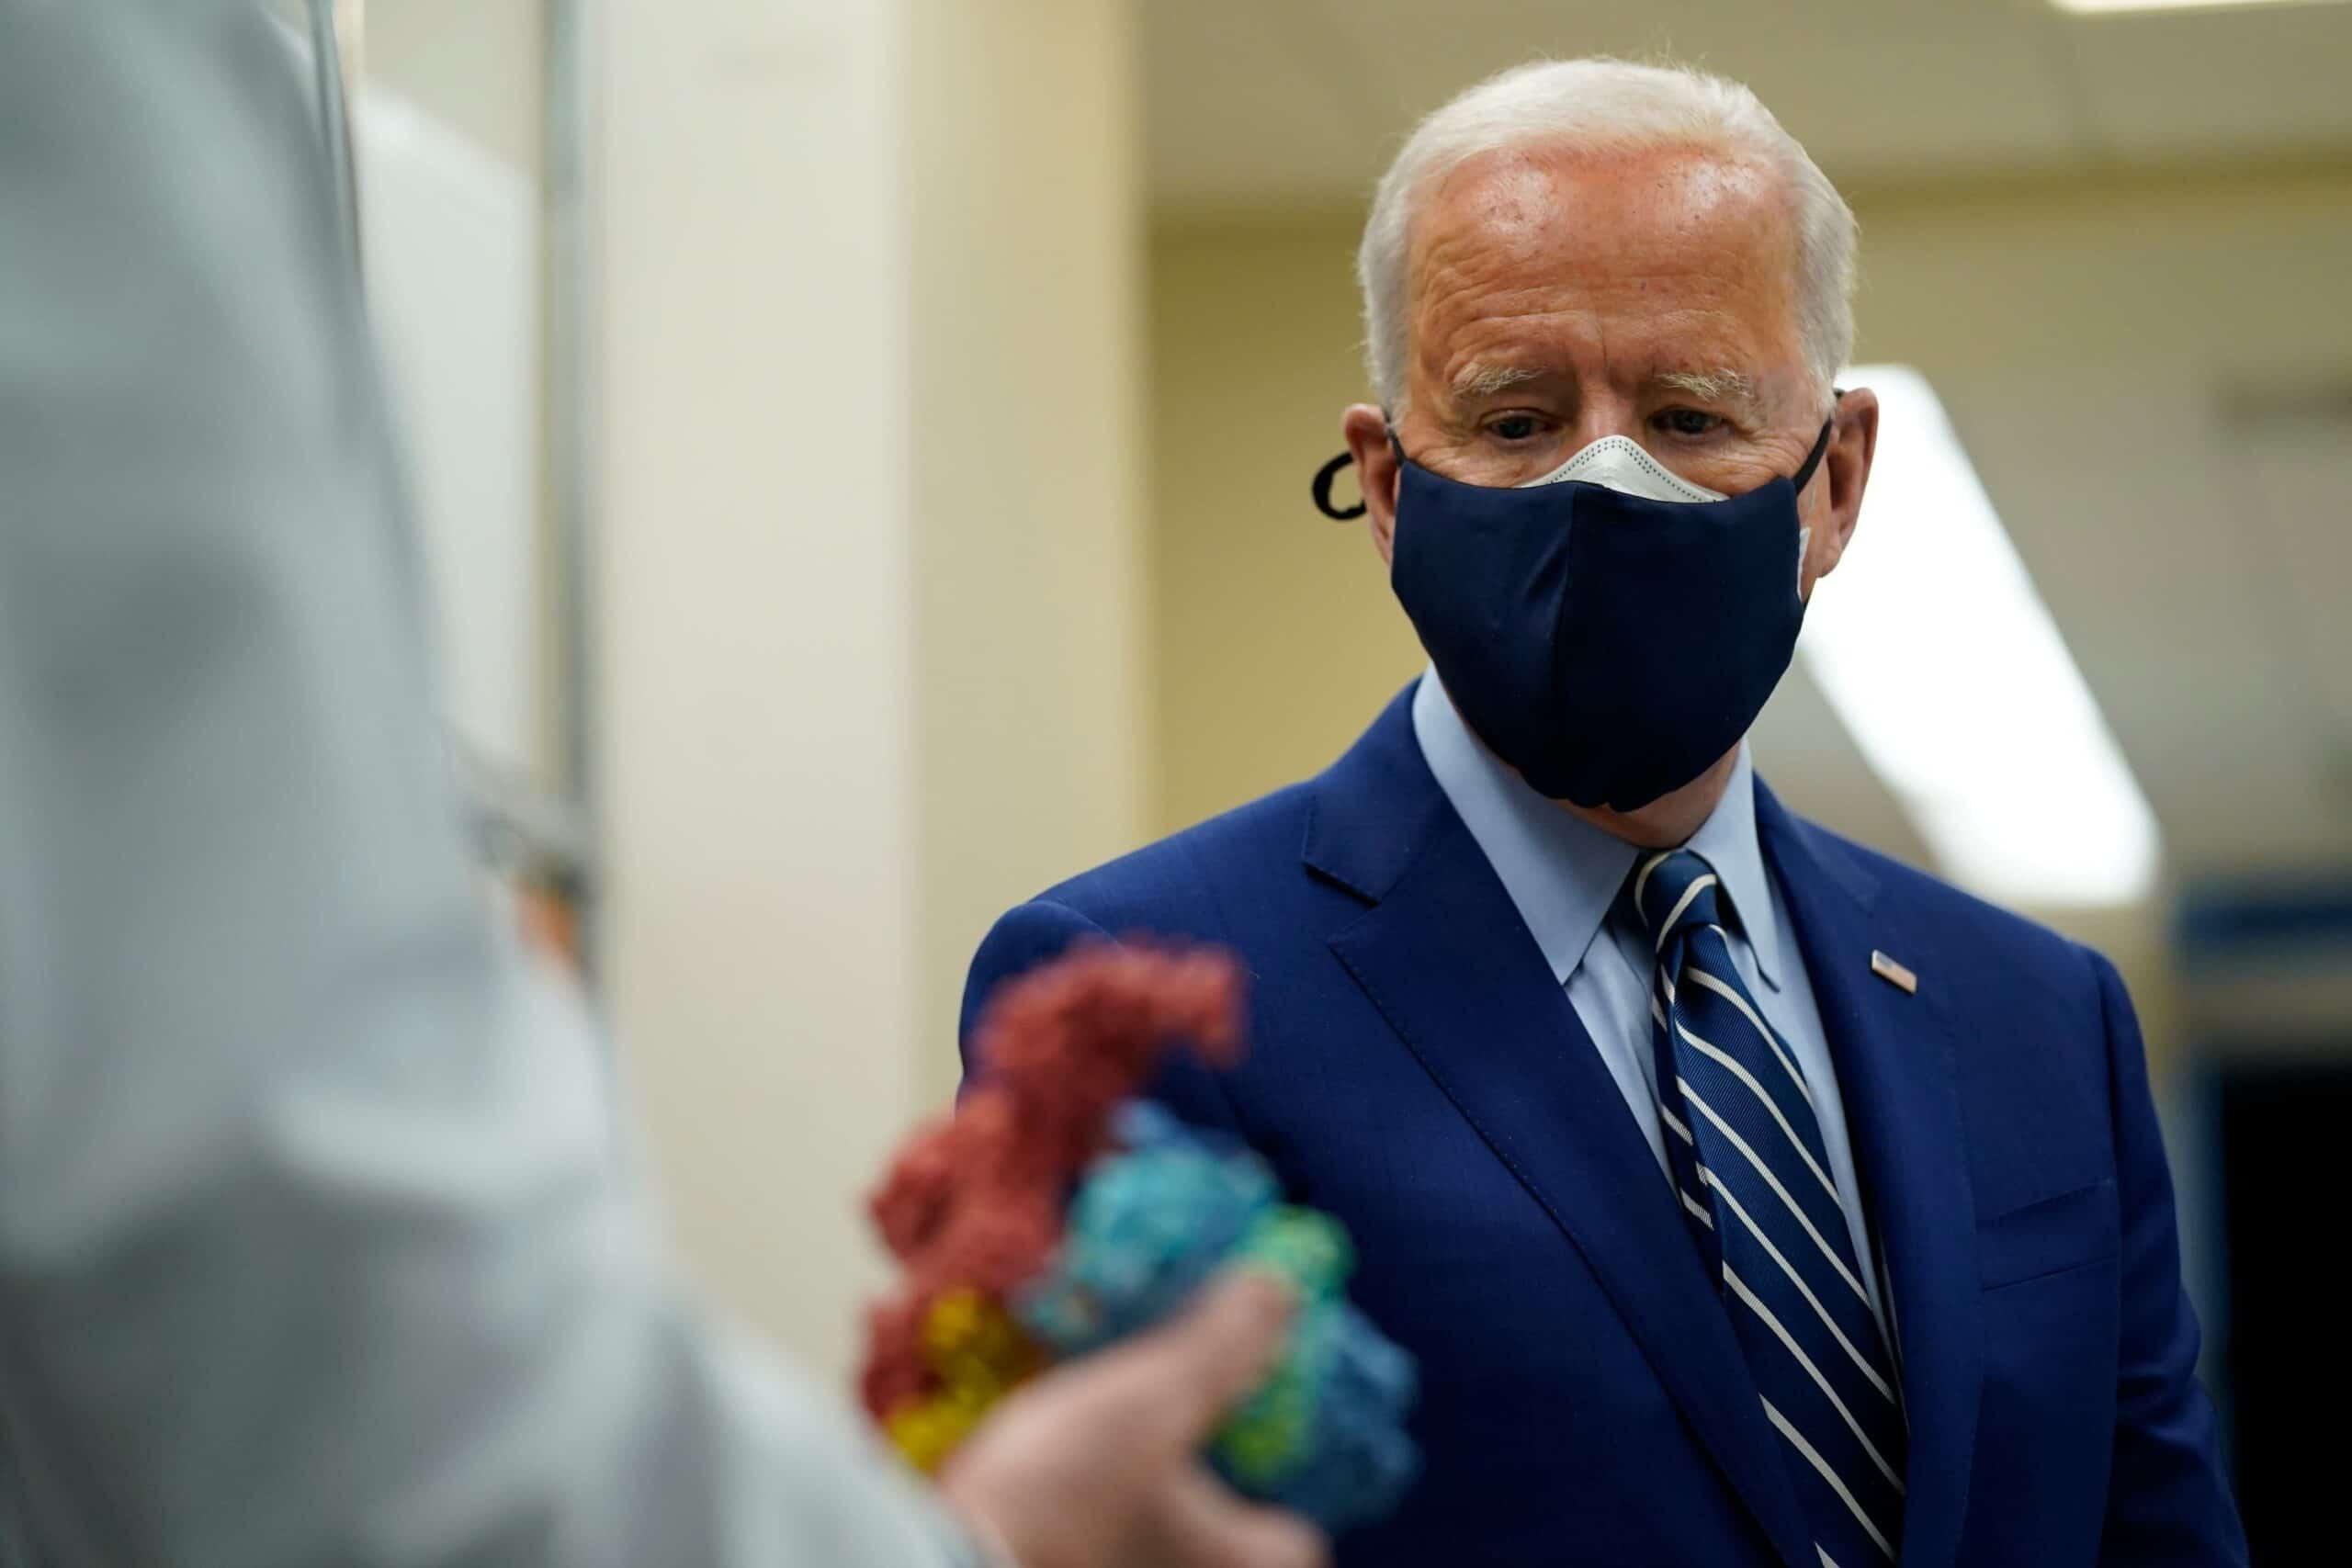 joe biden in double facemask scaled